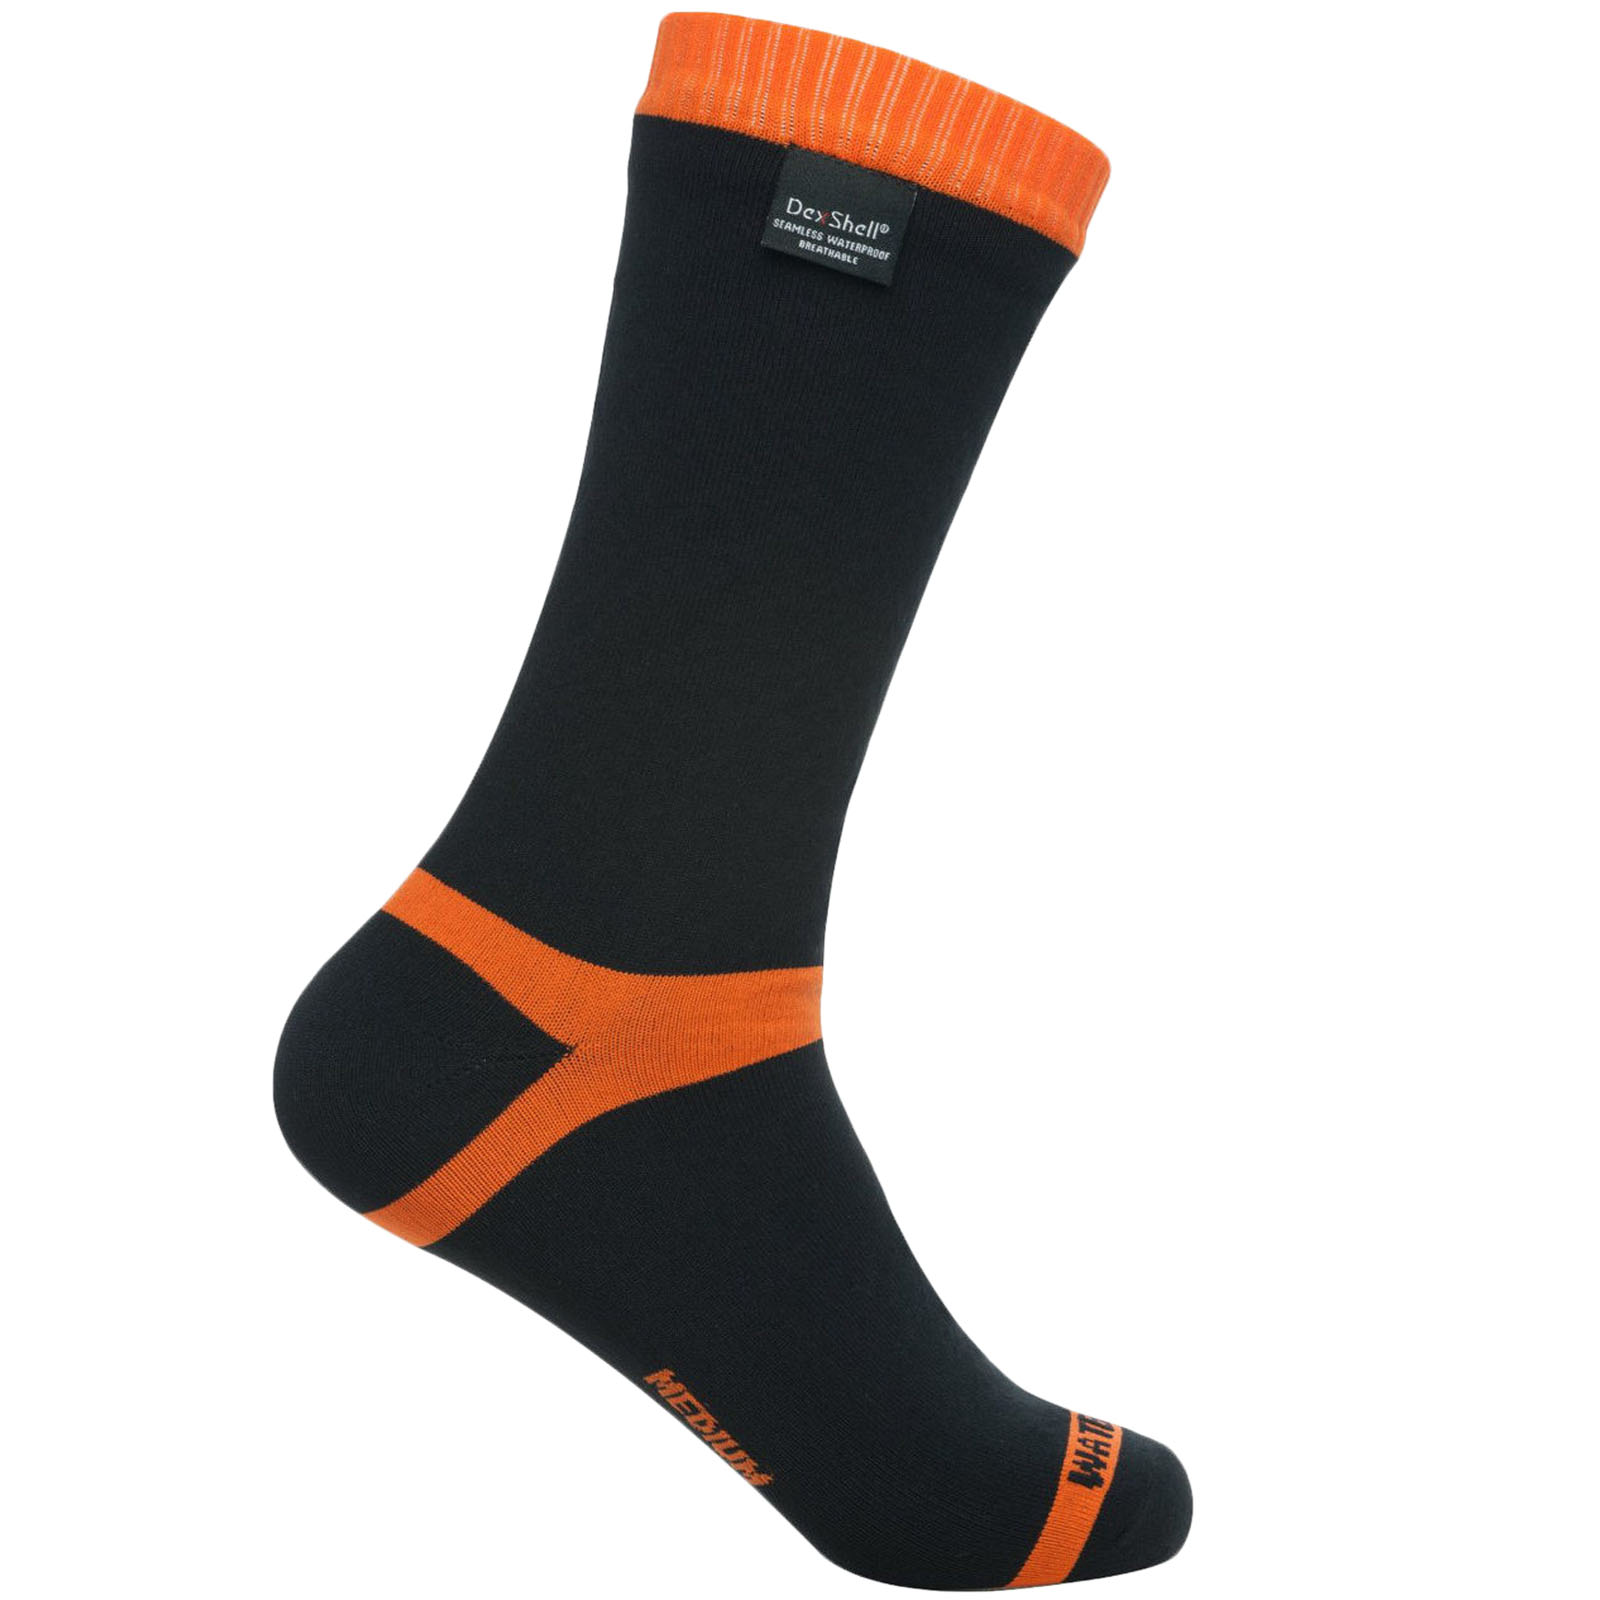 Dexshell Hytherm Pro calze impermeabili a met/à polpaccio